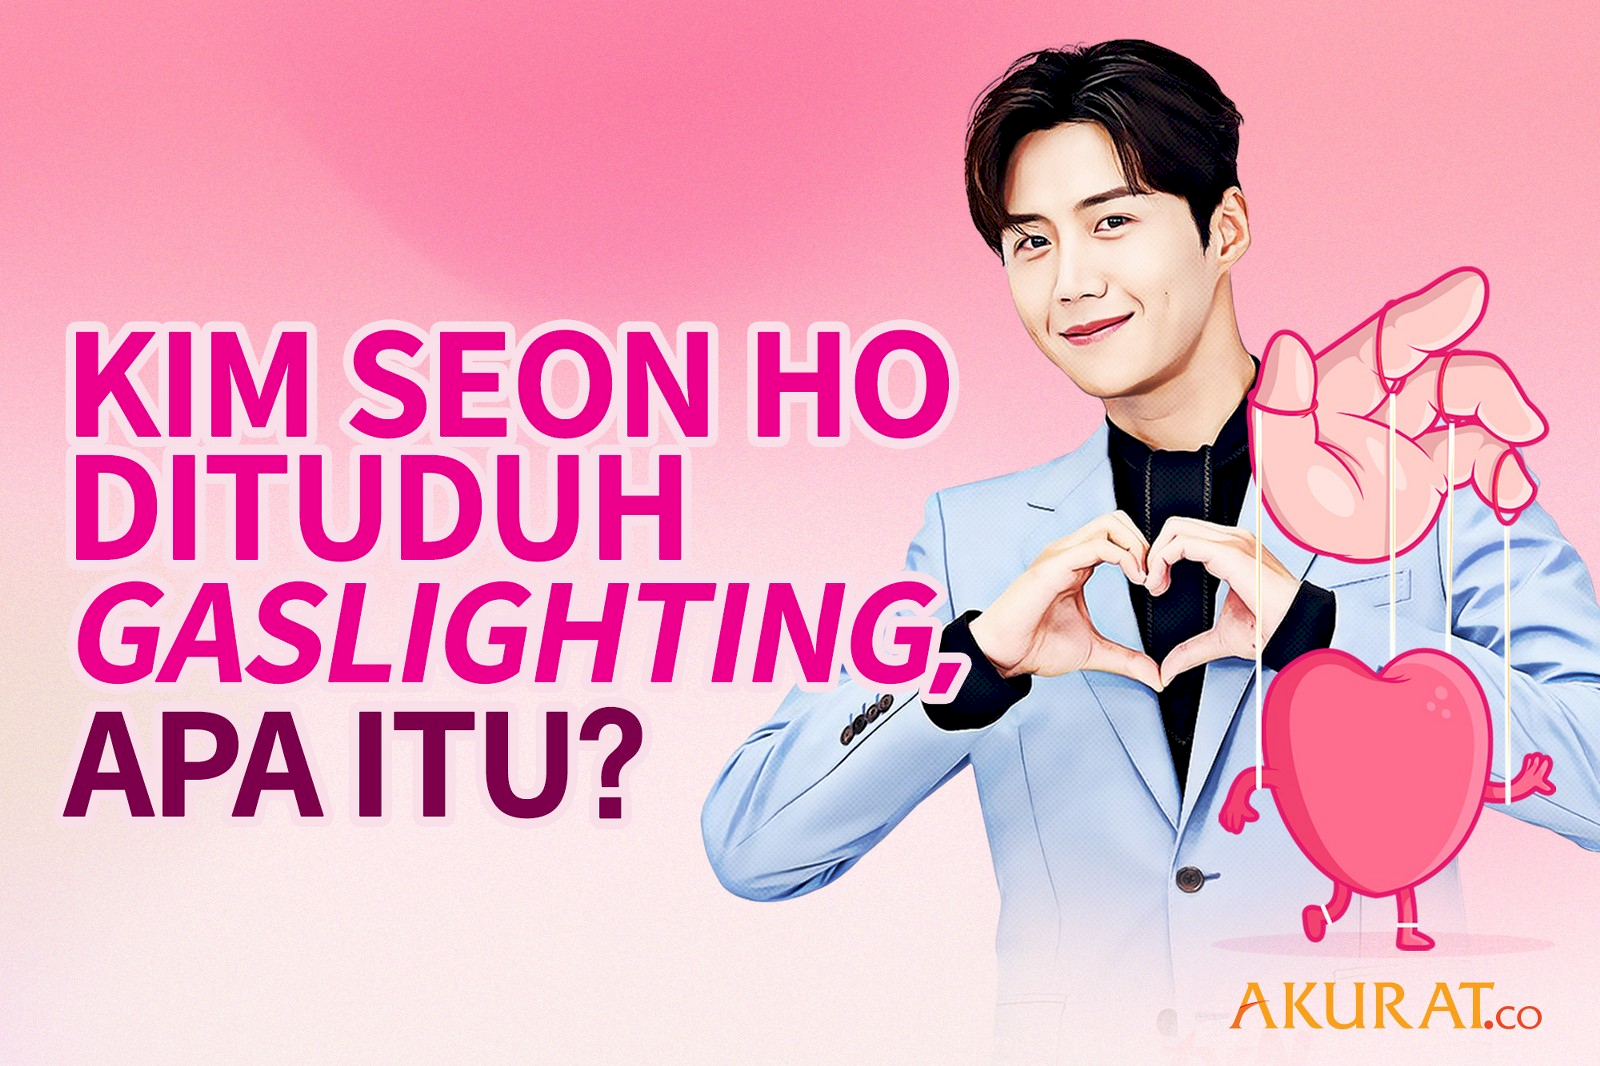 Kim Seon Ho Dituduh Gaslighting, Apa itu?